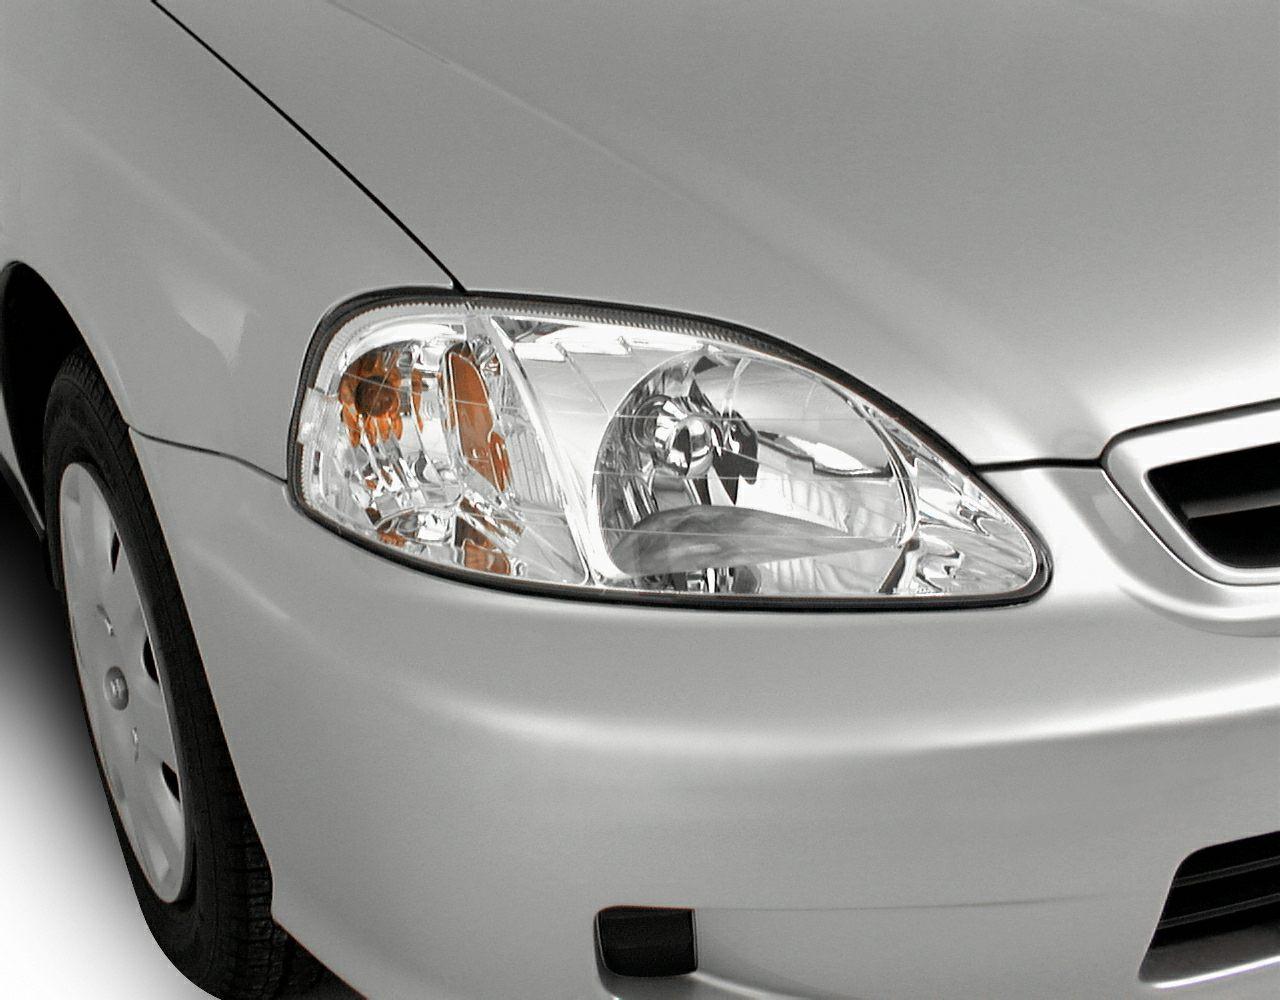 2000 Honda Civic Exterior Photo